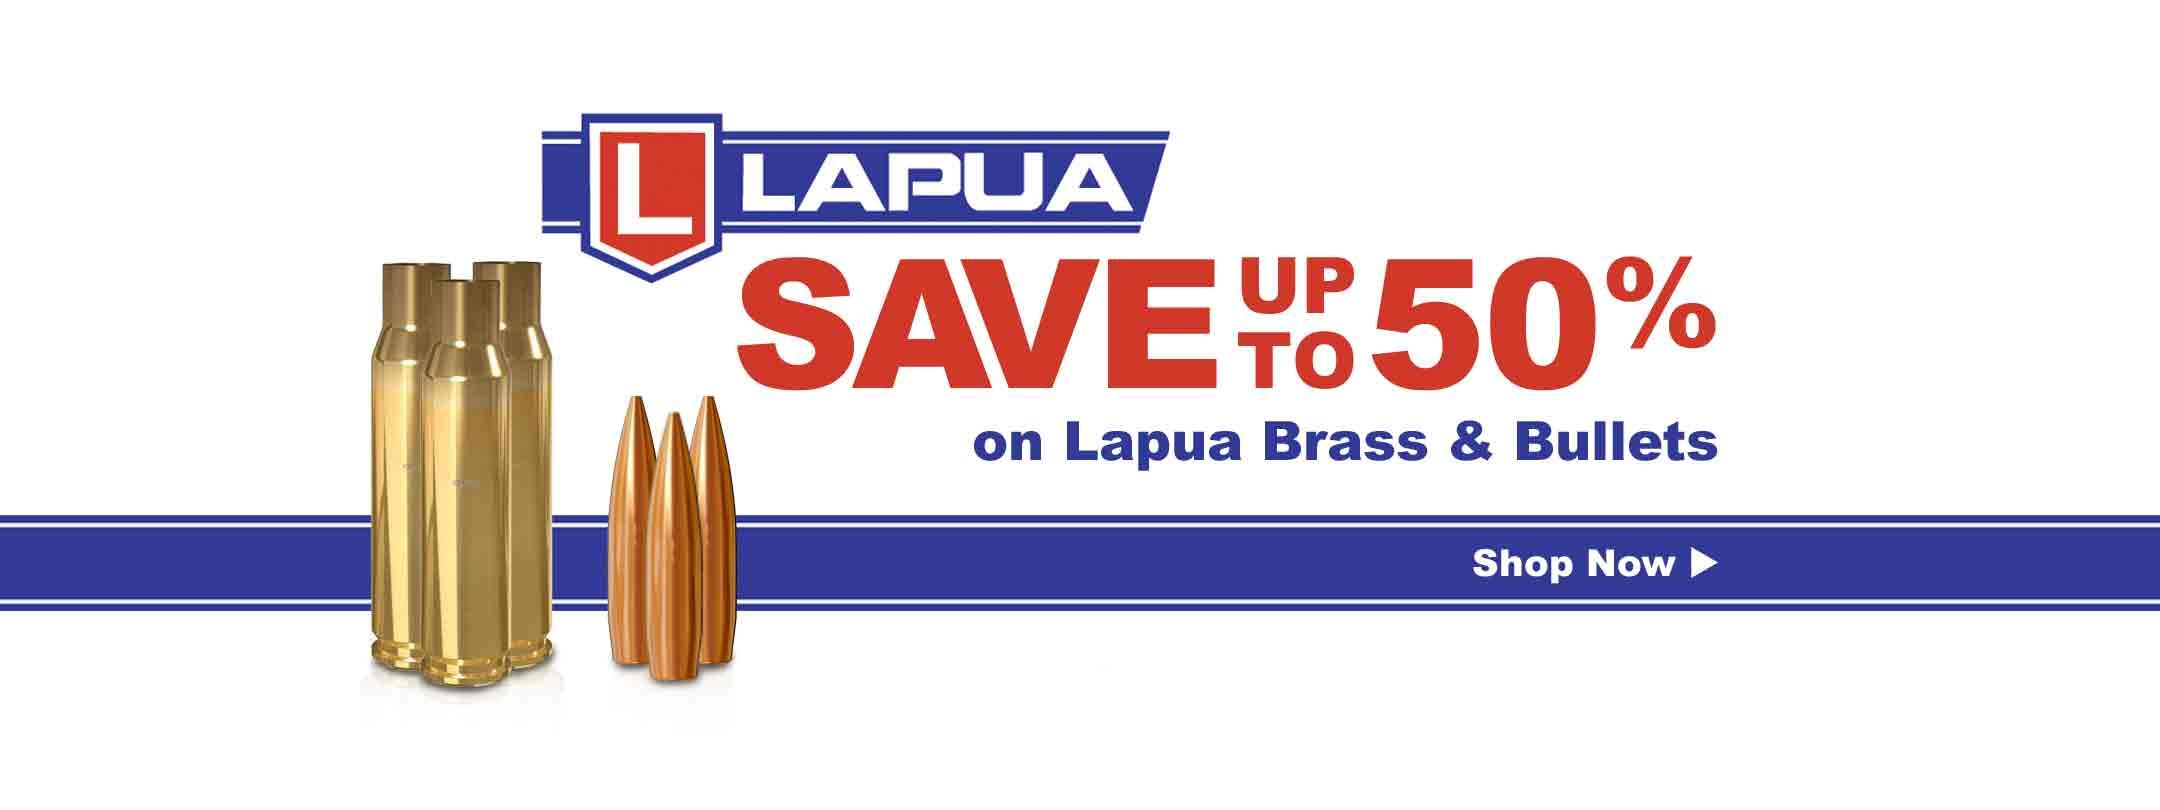 Lapua Brass & Bullets